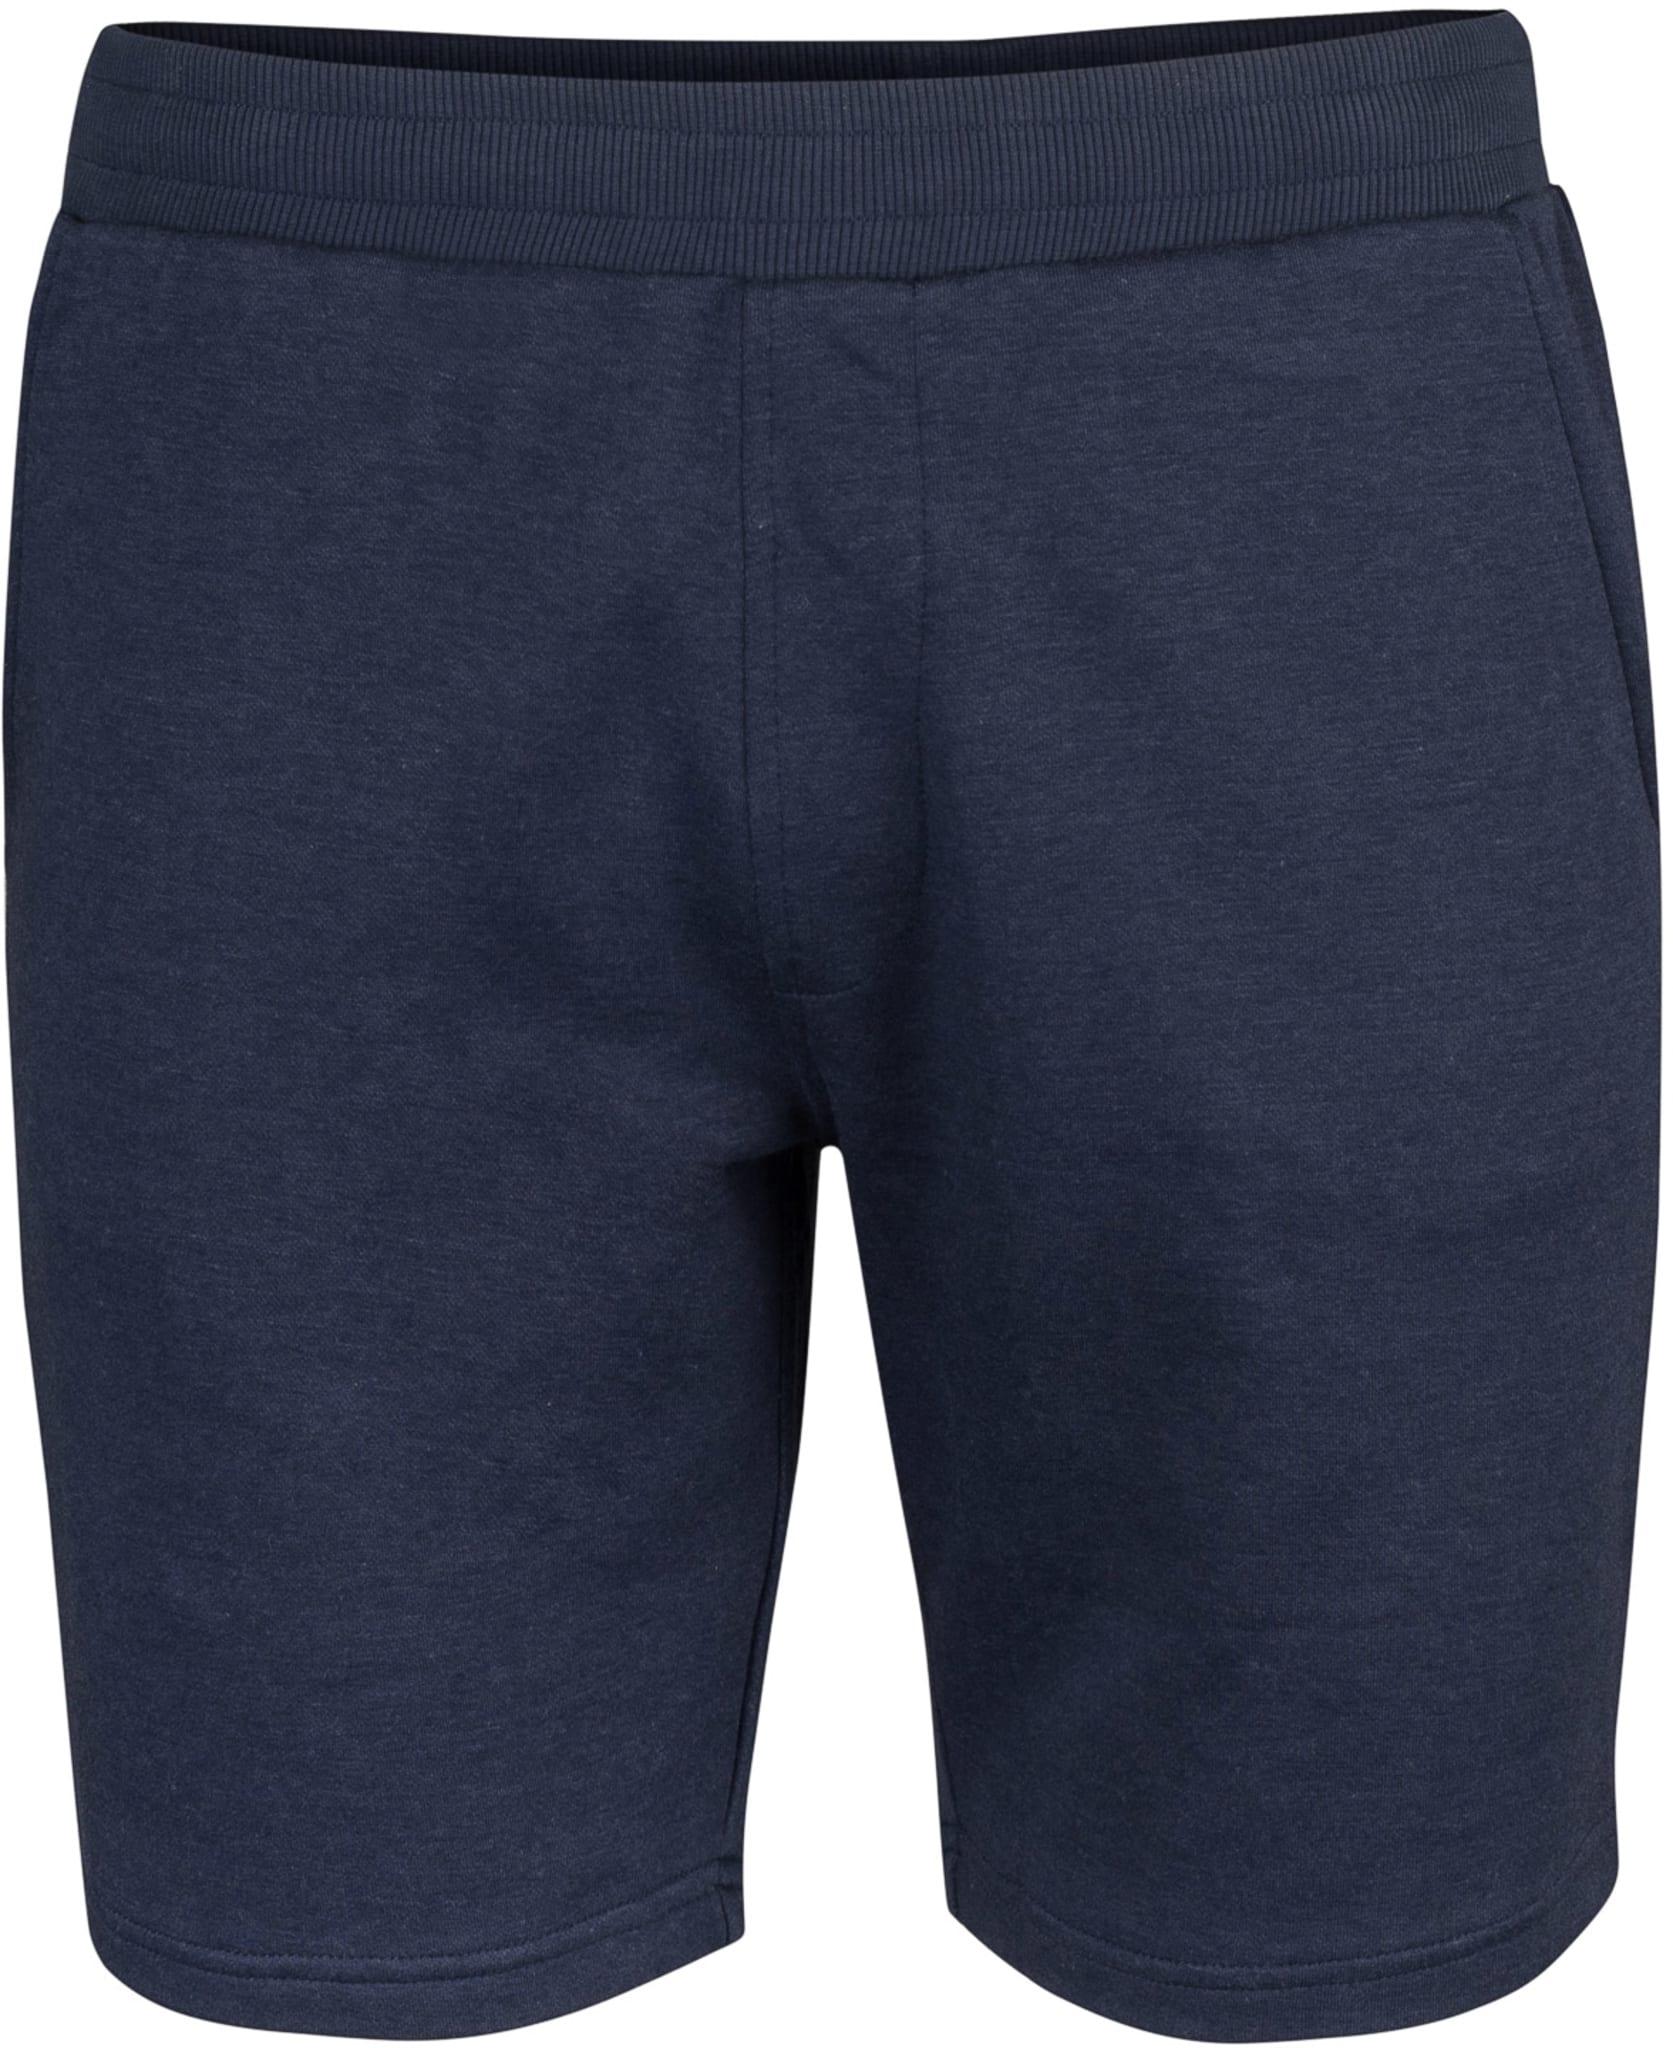 Base Sweat Shorts